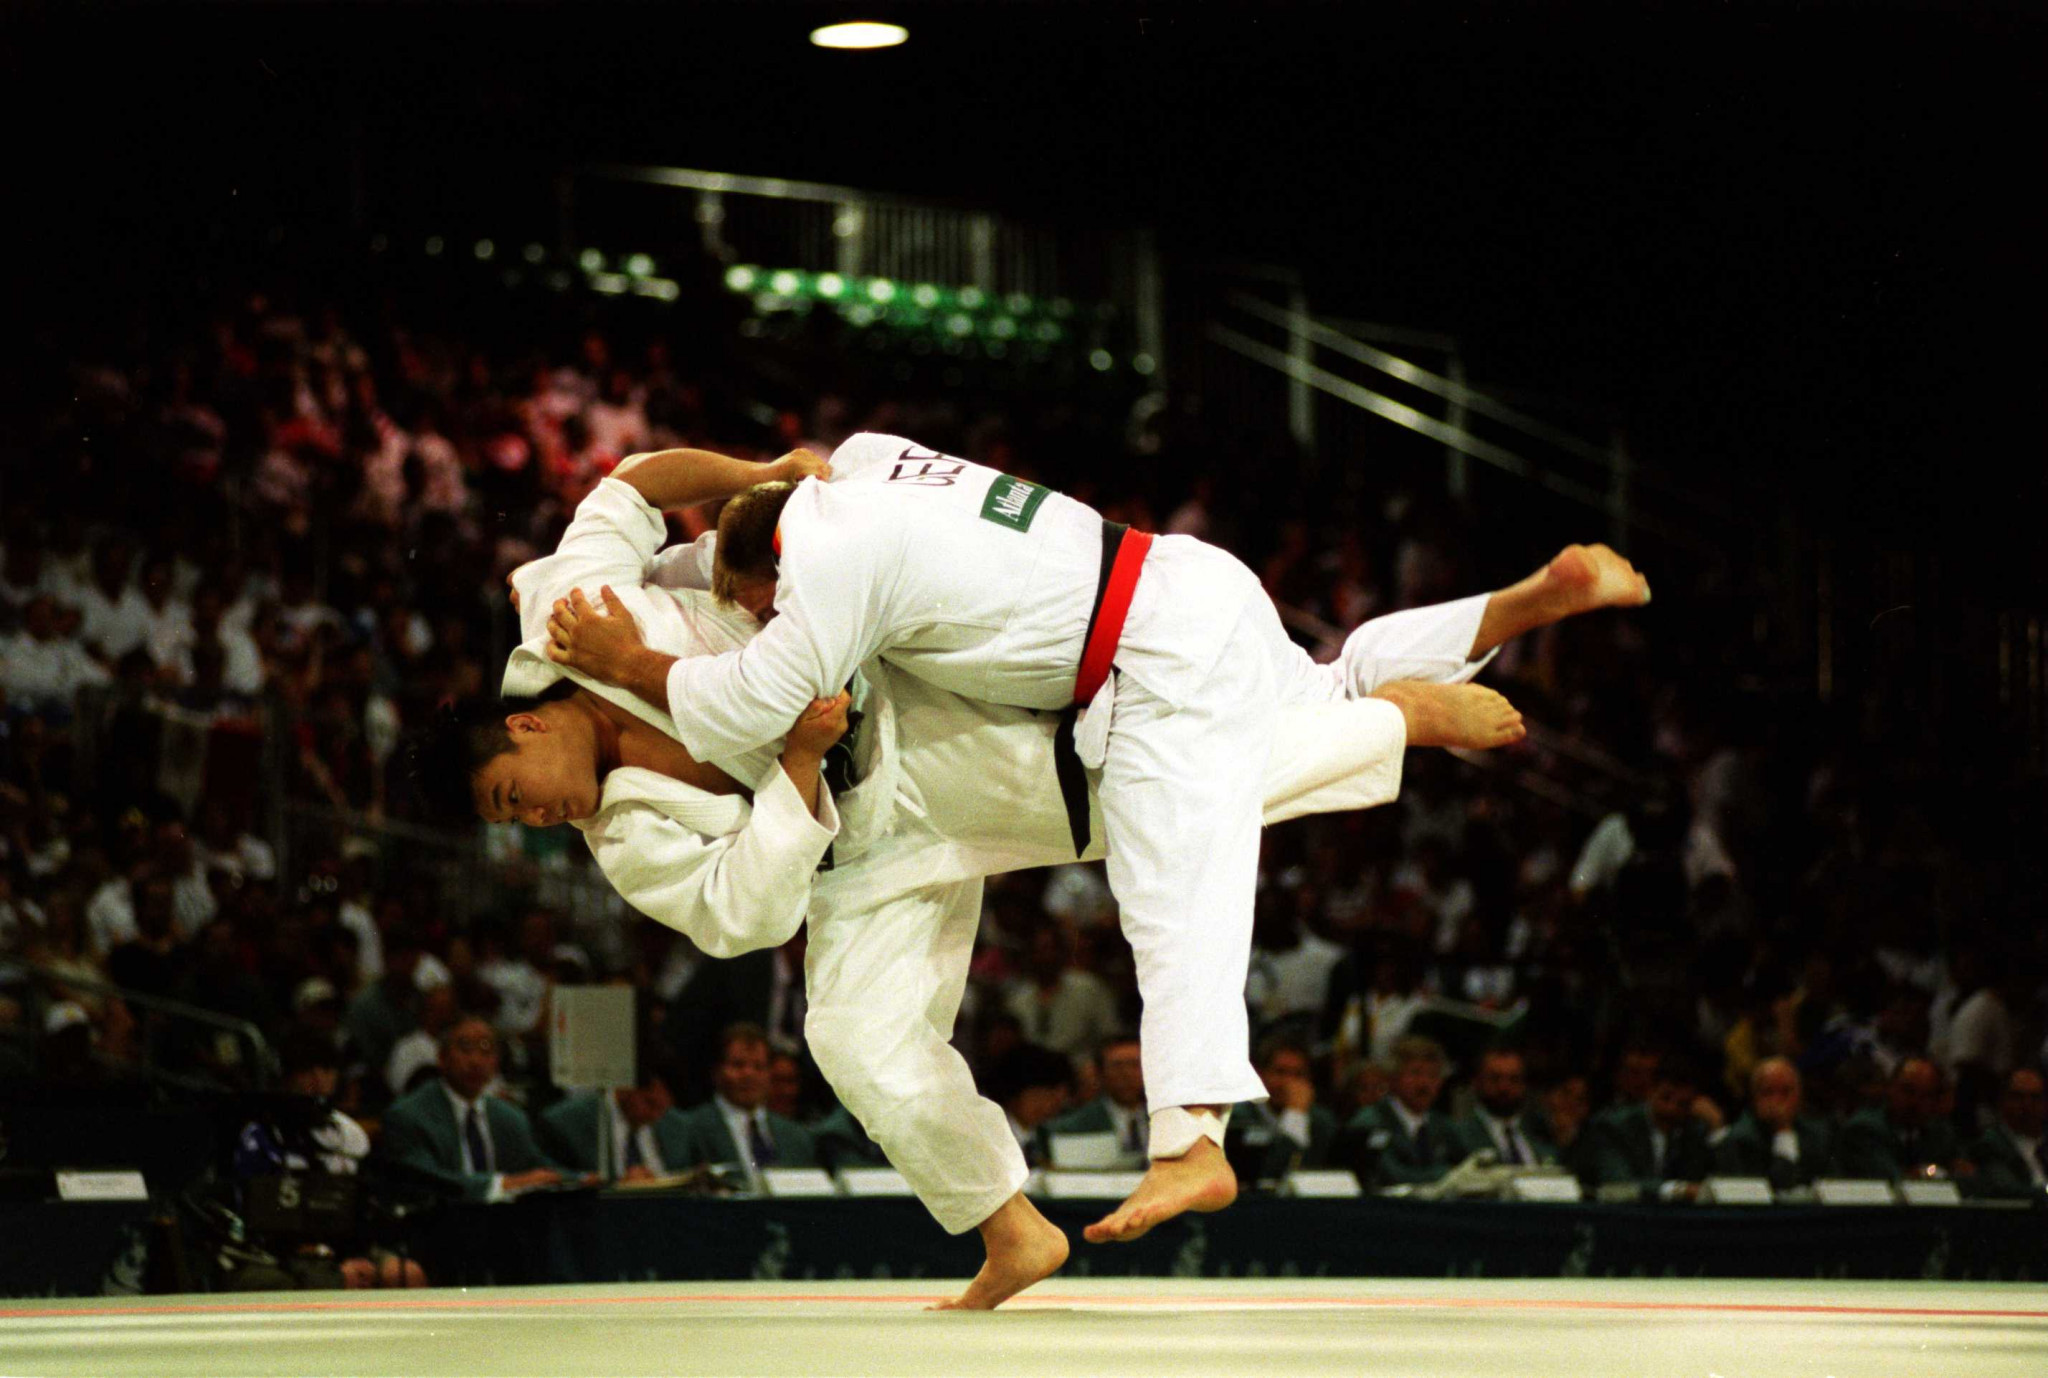 Olympic Games in Atlanta, Georgia. World Congress Centre. Heavyweight Judo. David Douillet (Fra) 1st. Eernesto Perezi (Esp) 2nd ©Getty Images